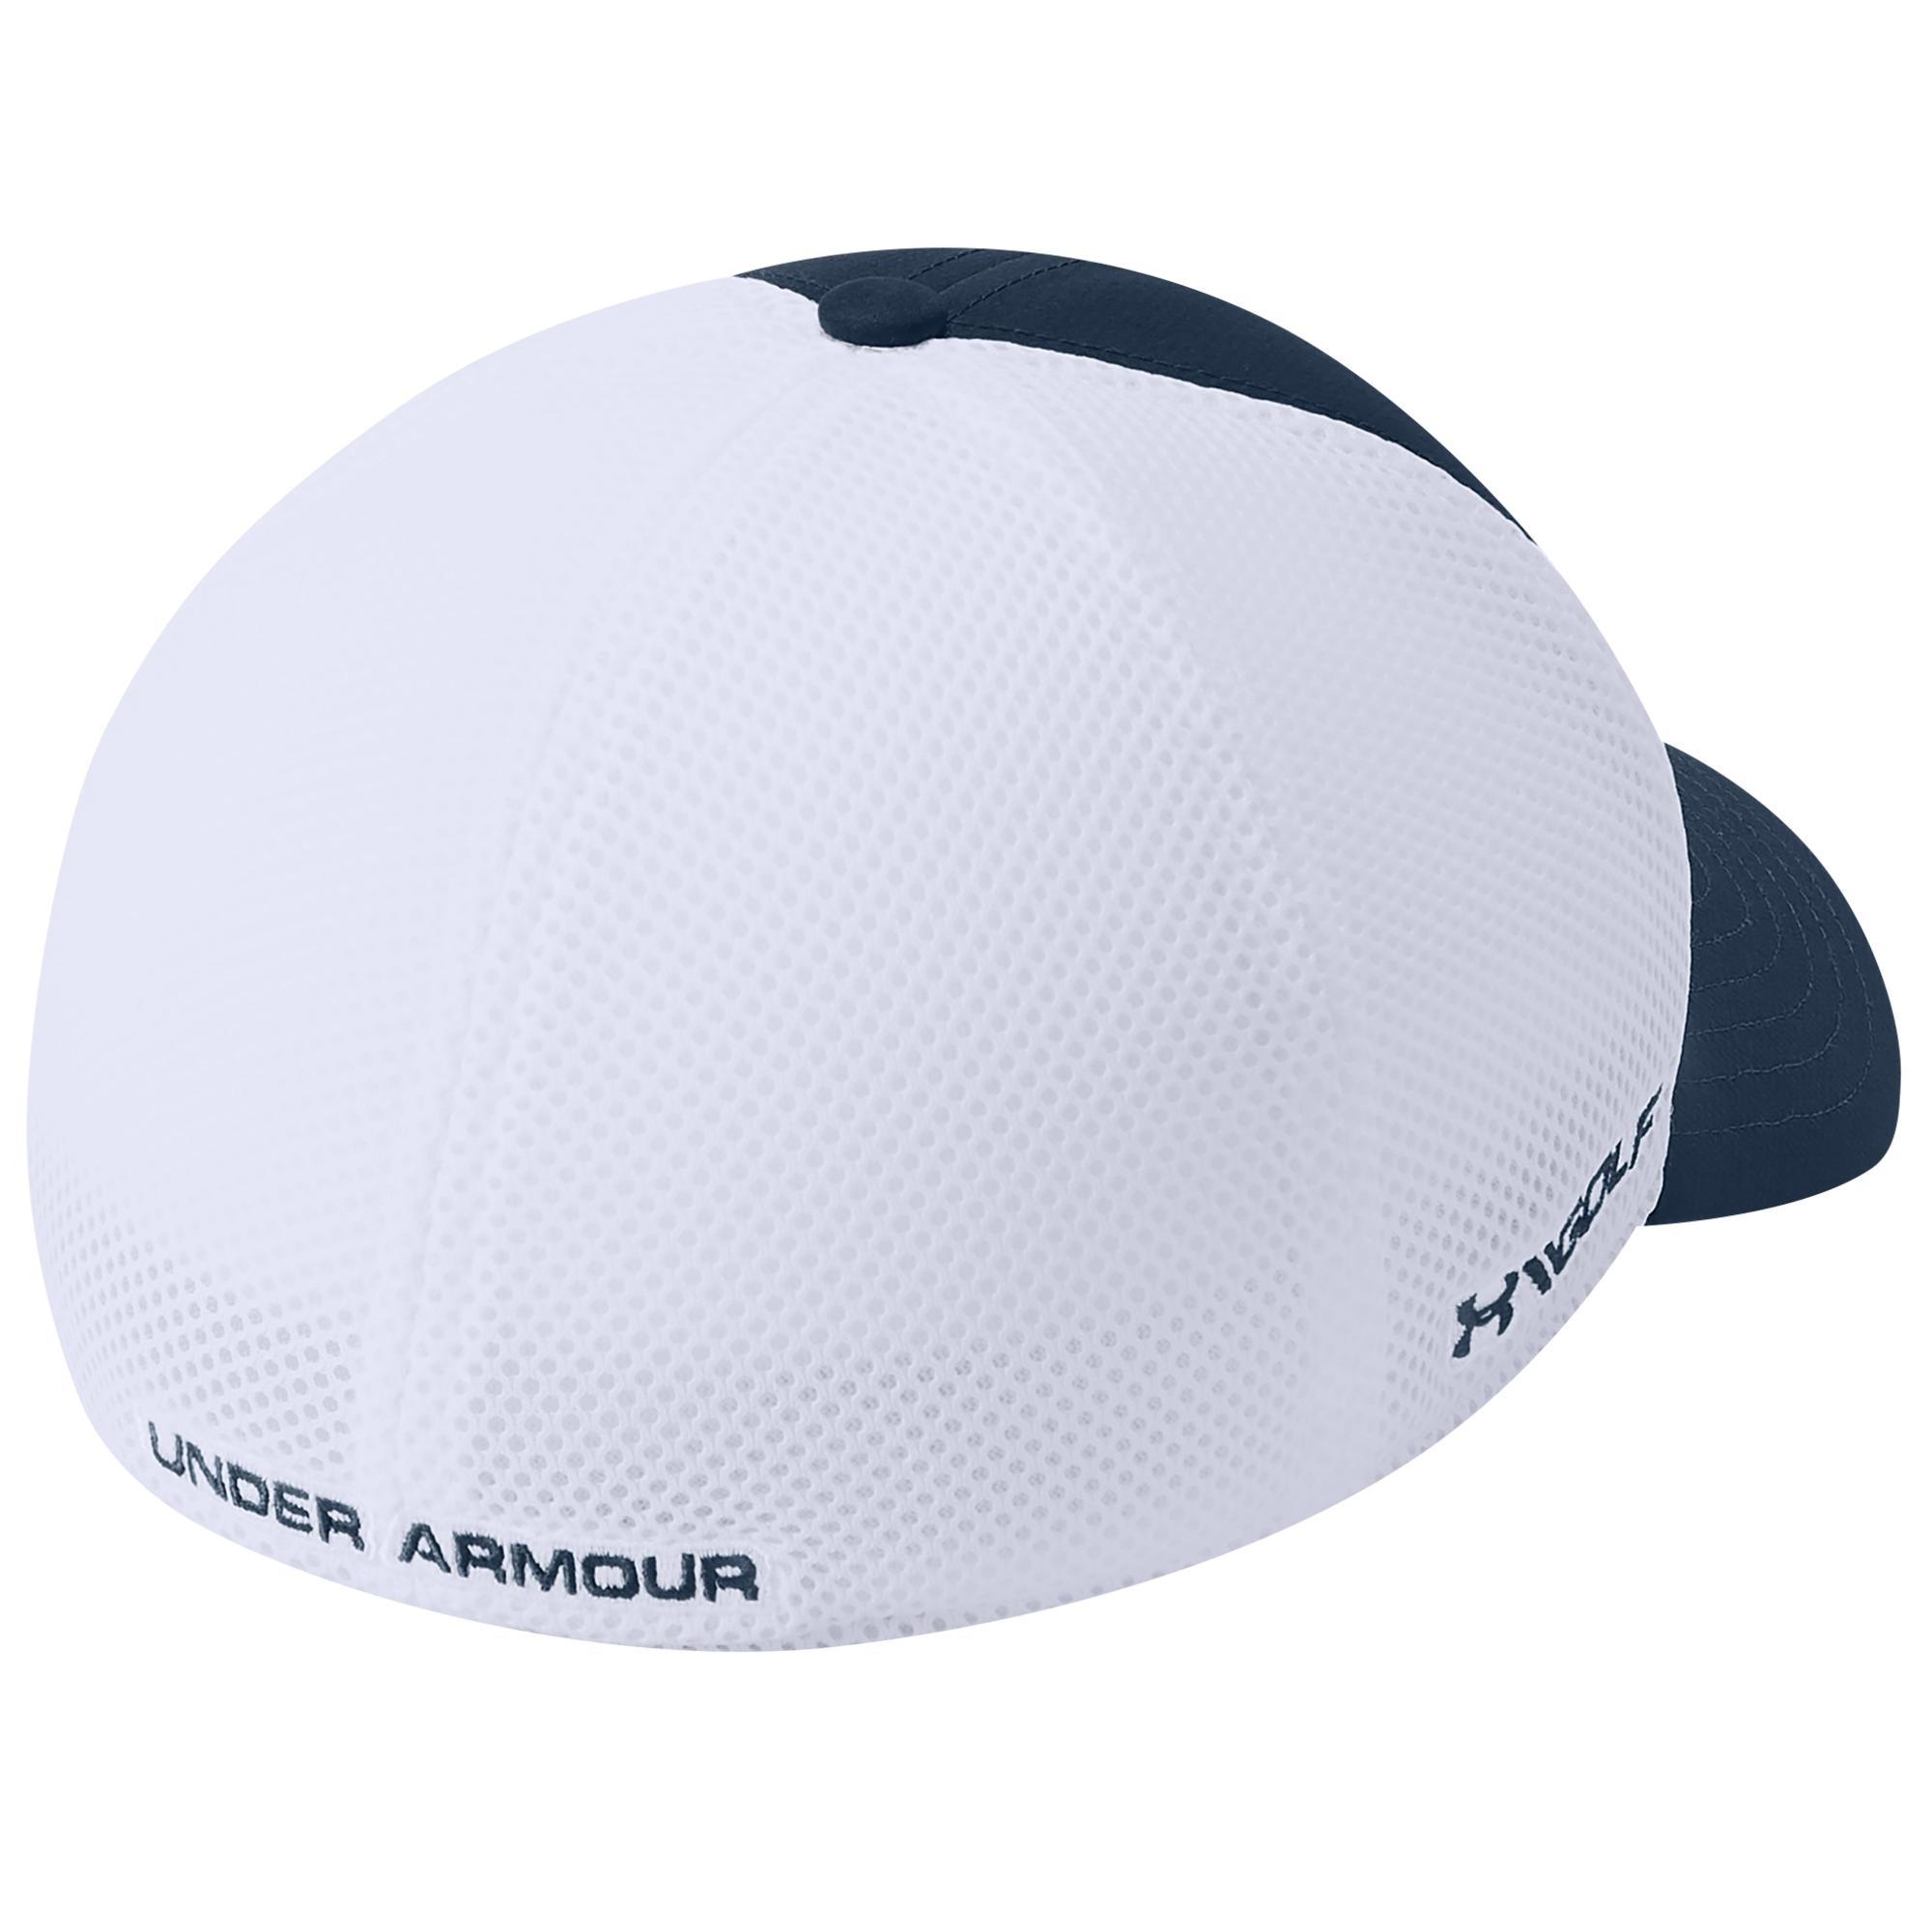 58d081a7 Under Armour - White Tb Classic Mesh Golf Cap for Men - Lyst. View  fullscreen